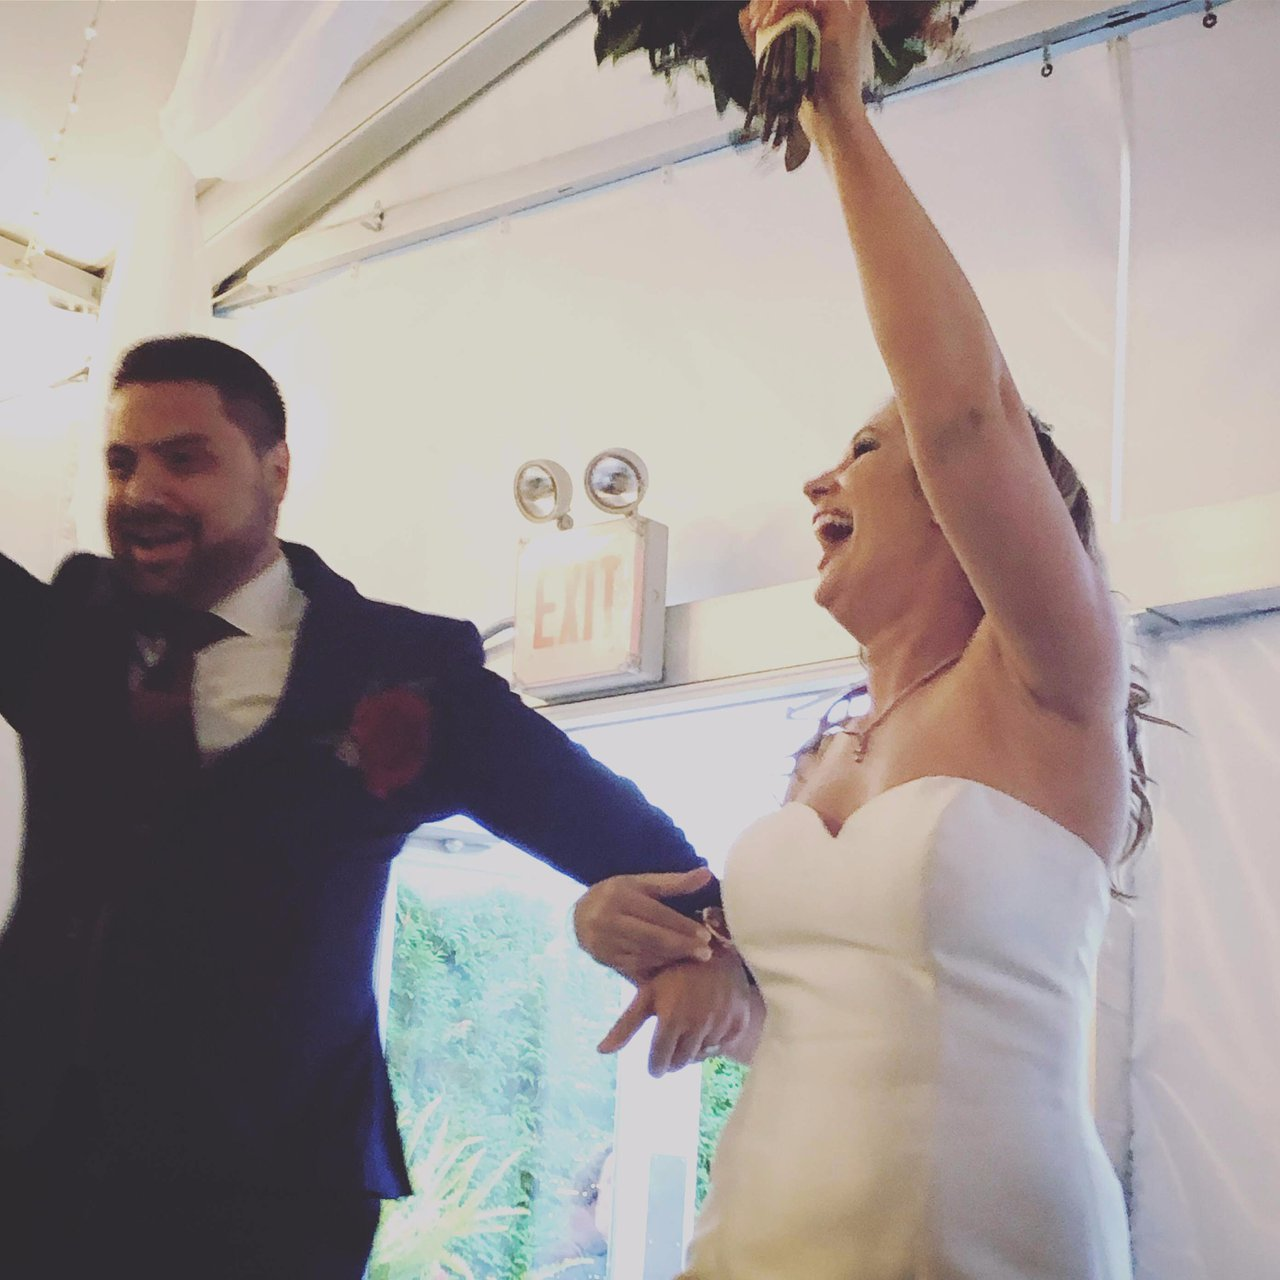 Leyjla and John Wedding—#LCJB2019 photo B35866EE-0A54-44F6-9244-E45DA0FB620D.jpg